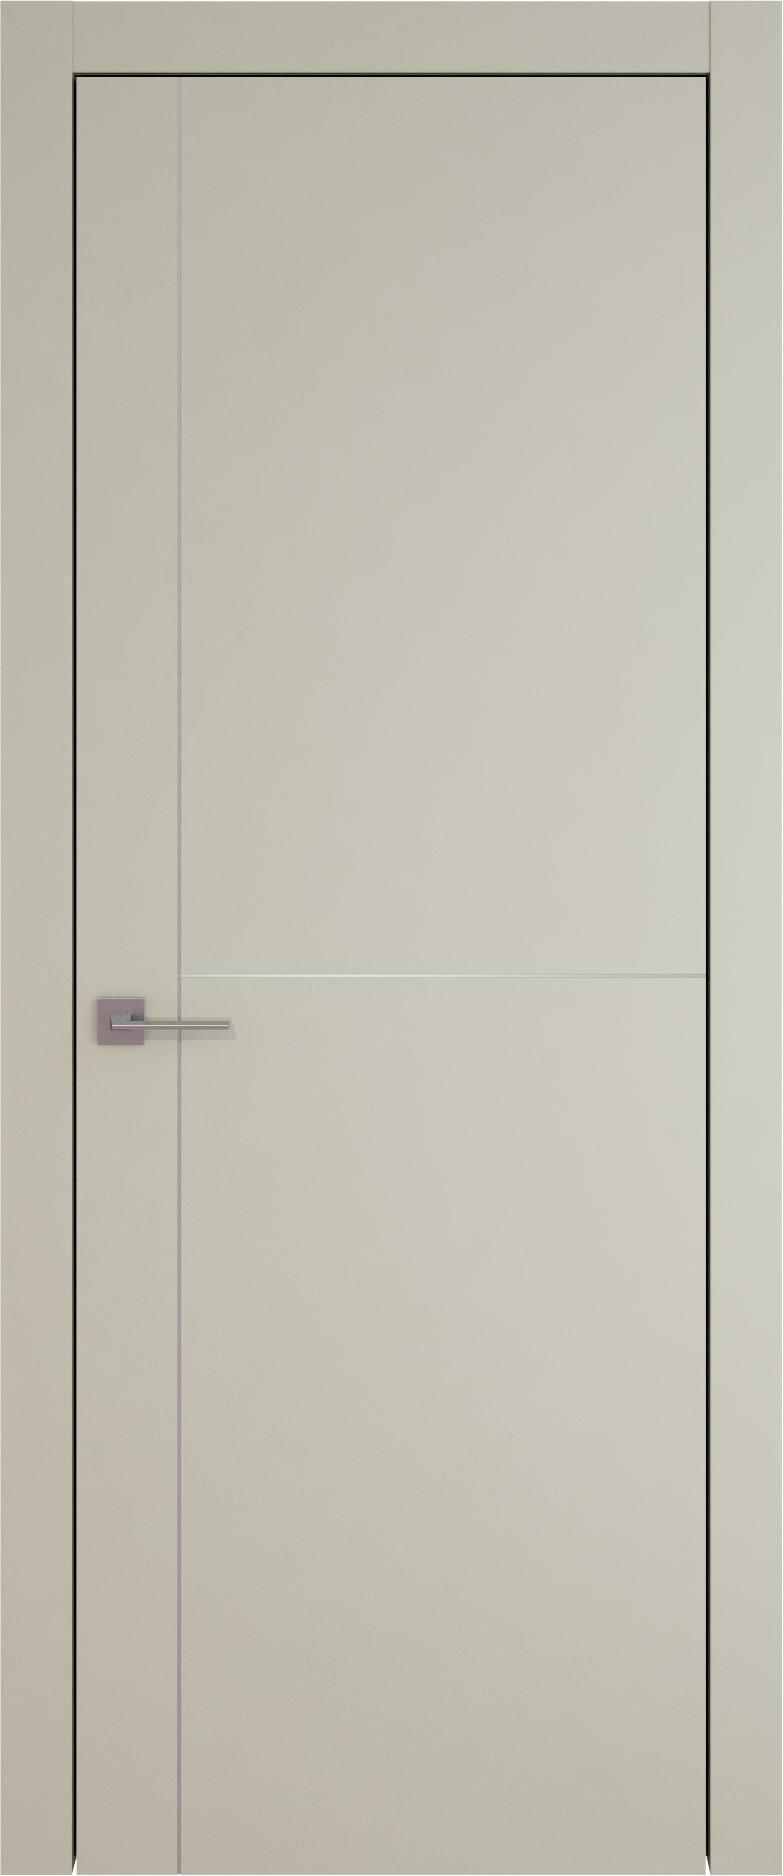 Tivoli Е-3 цвет - Серо-оливковая эмаль (RAL 7032) Без стекла (ДГ)